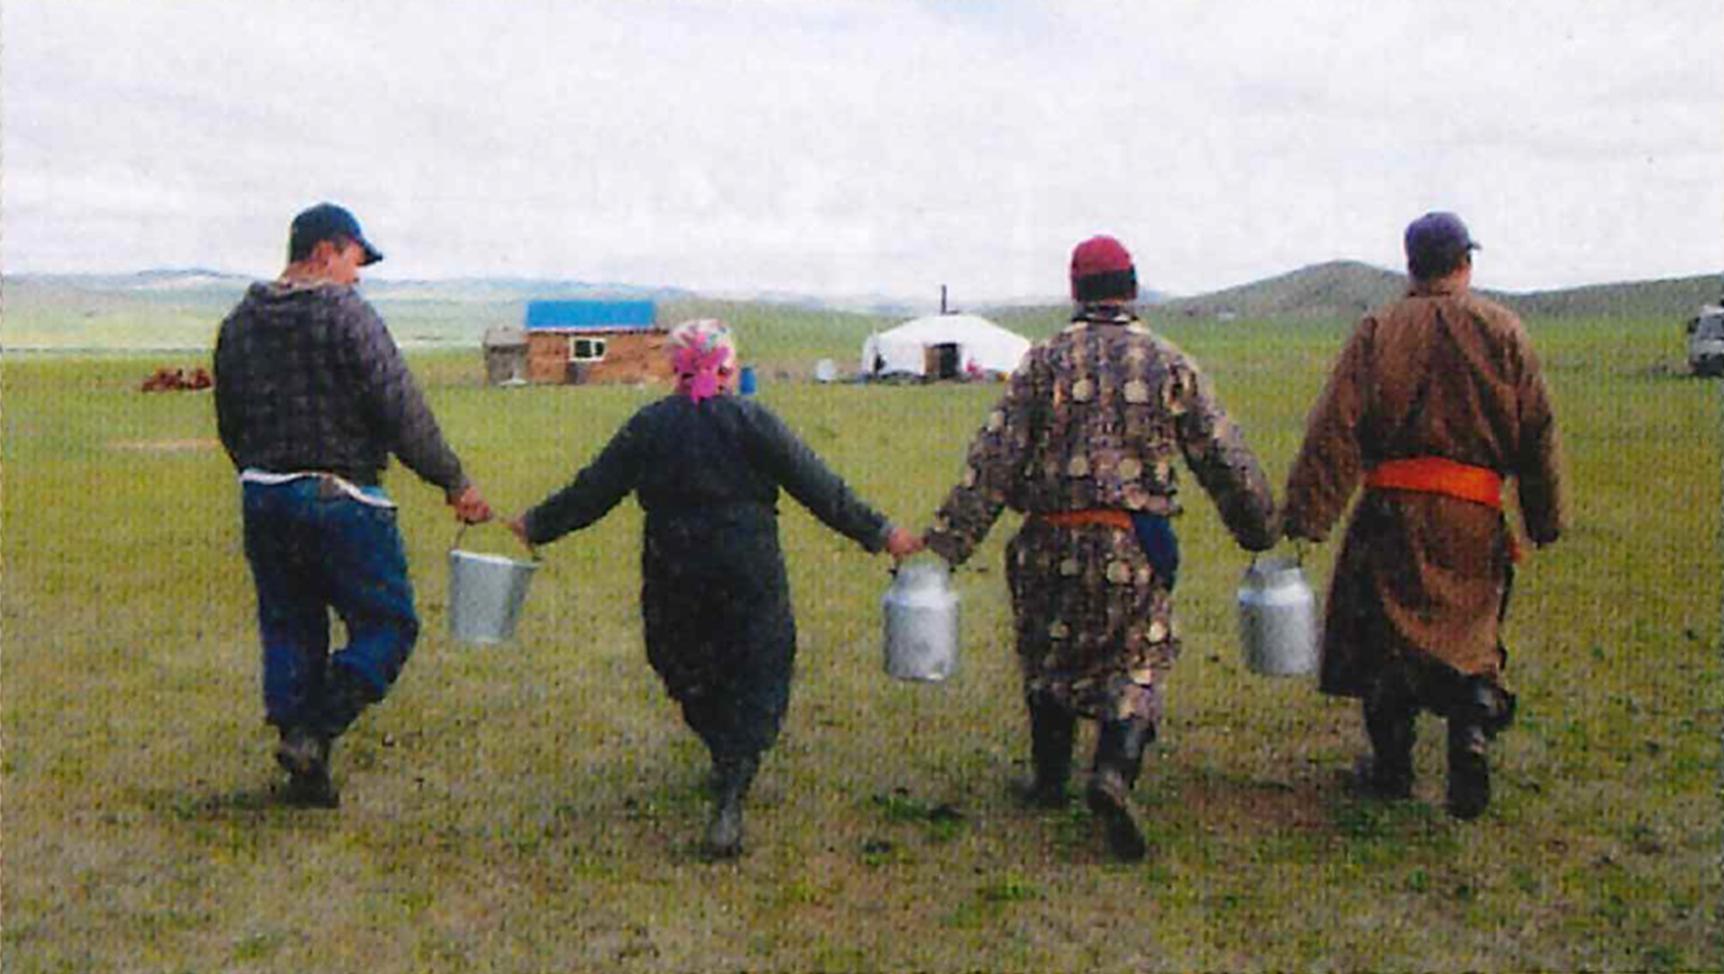 世界の乳文化図鑑㉑ 伝統的な皮袋の発酵容器